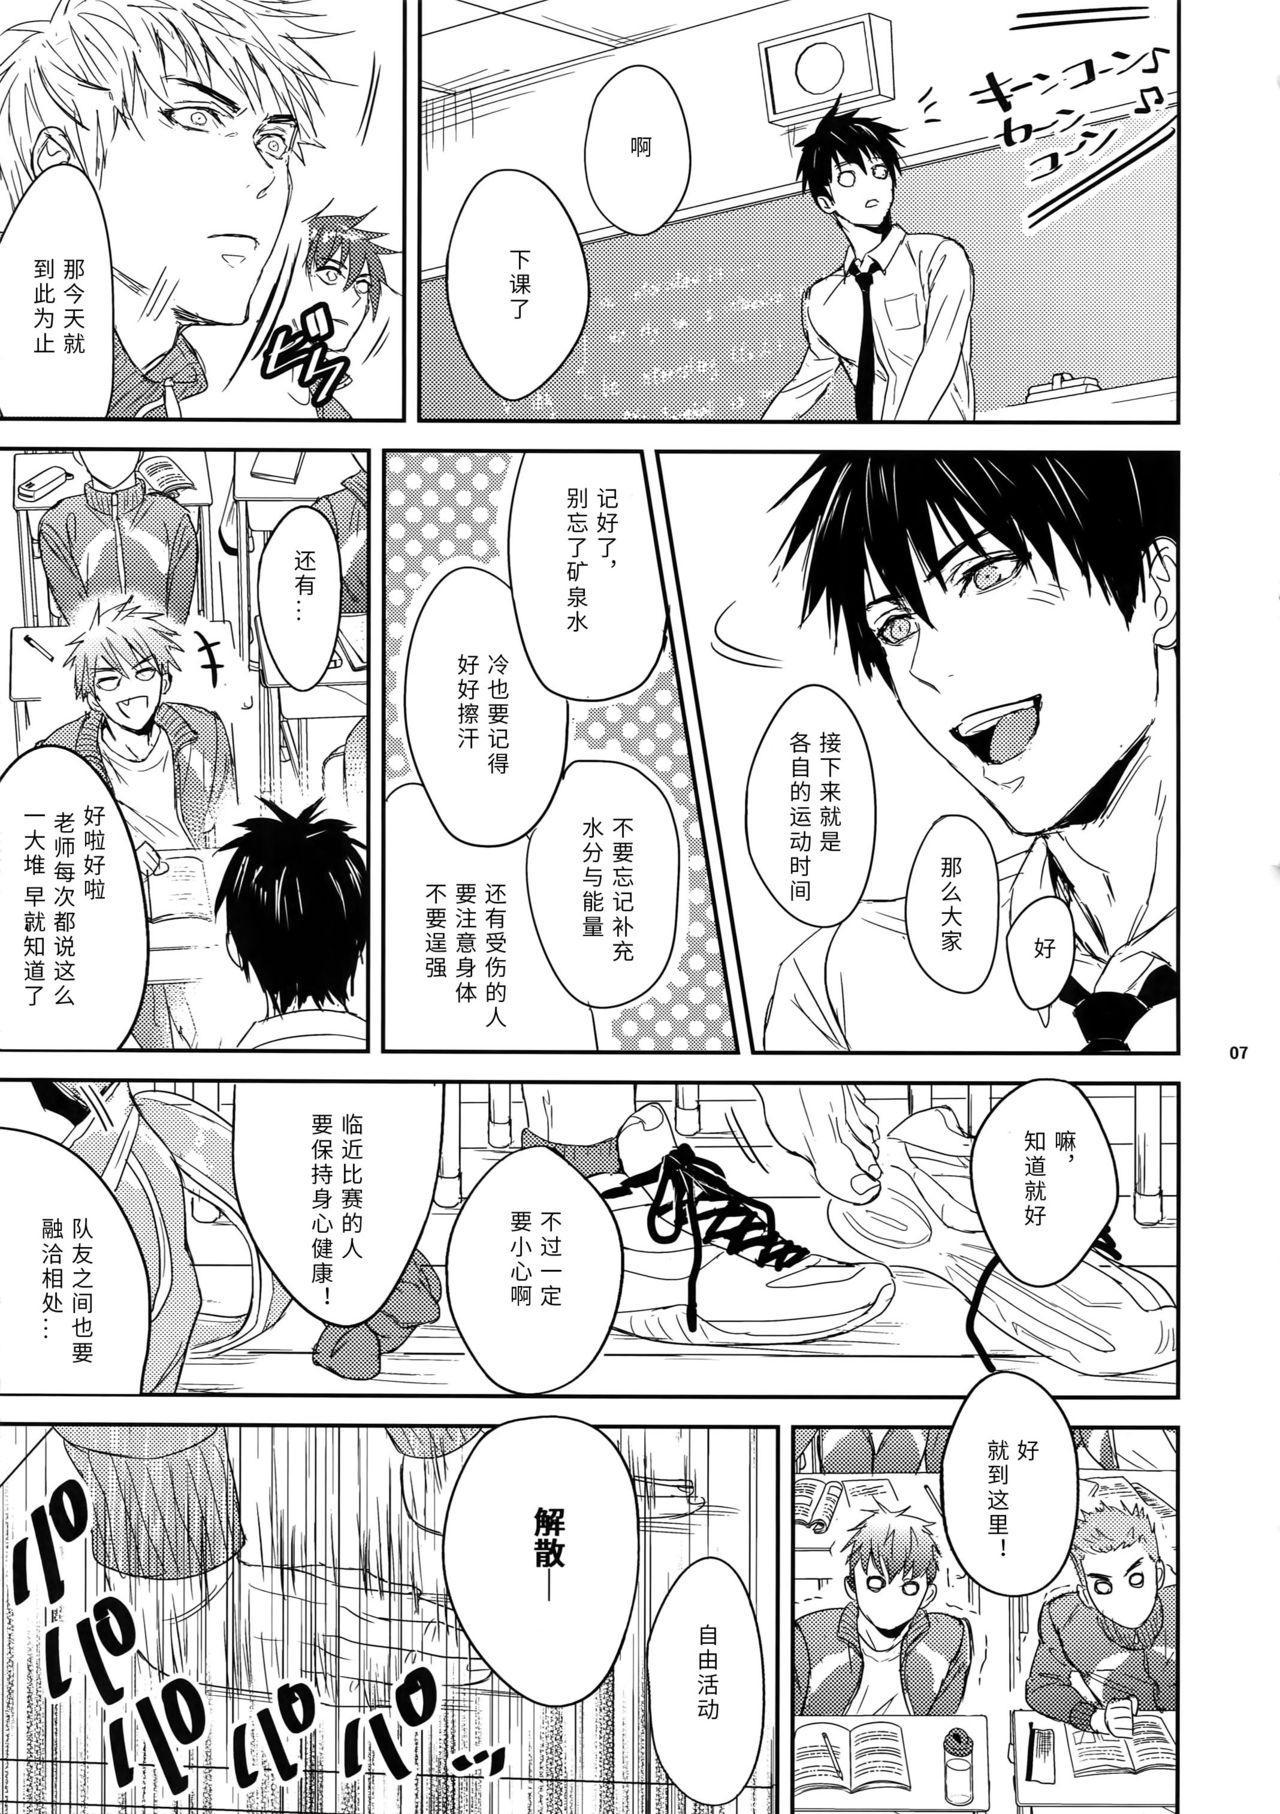 Sensei wa Nekketsu ga Areba Juubunda! | 老师只要热血就够了! 5